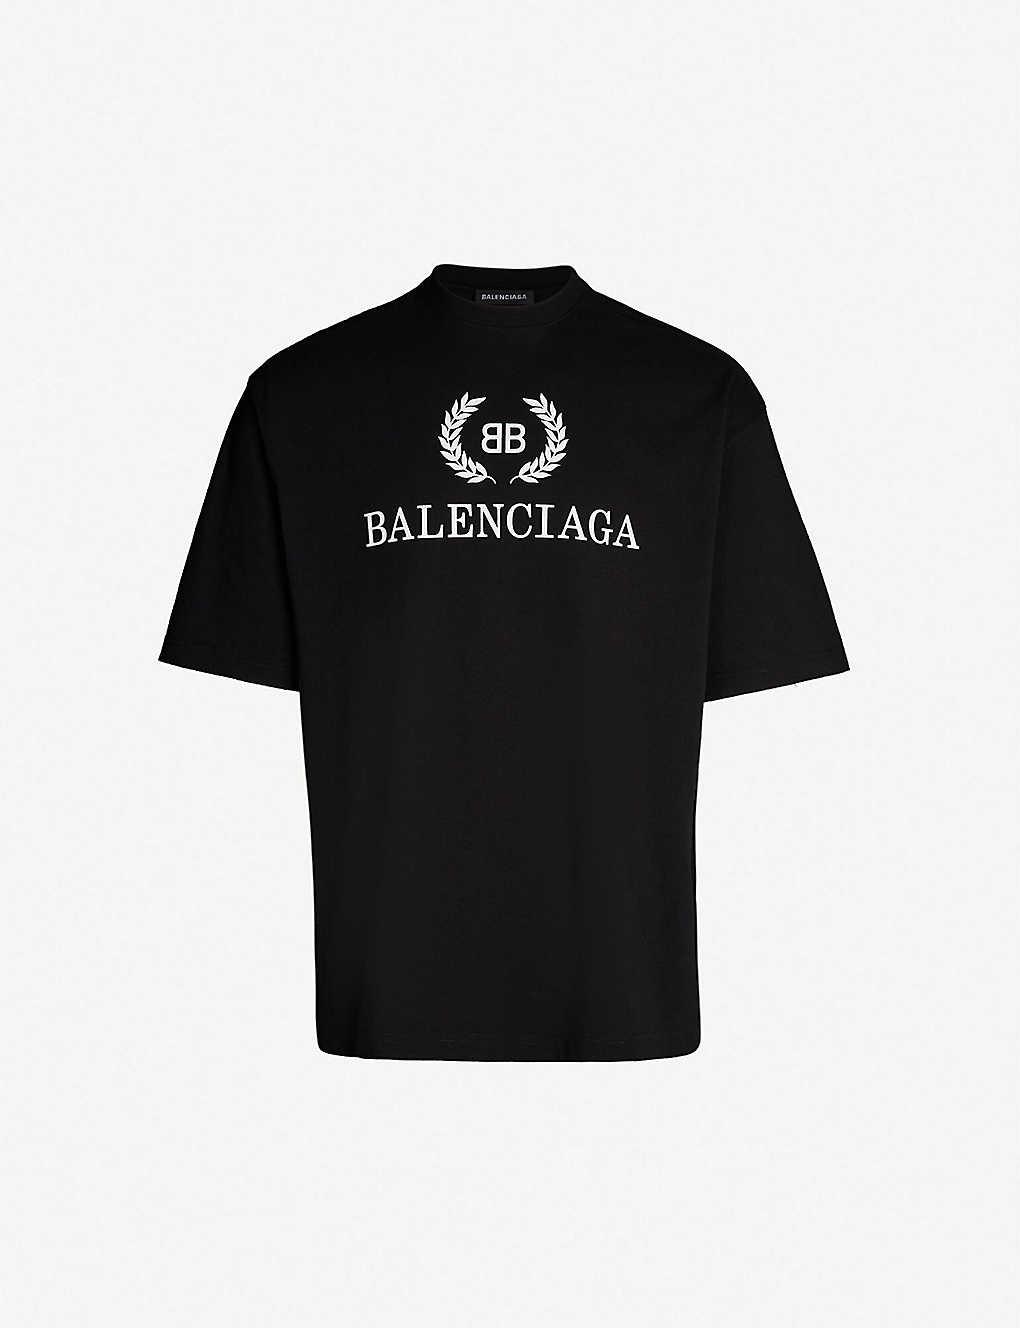 da1ee141e BALENCIAGA - Logo-print cotton-jersey T-shirt | Selfridges.com